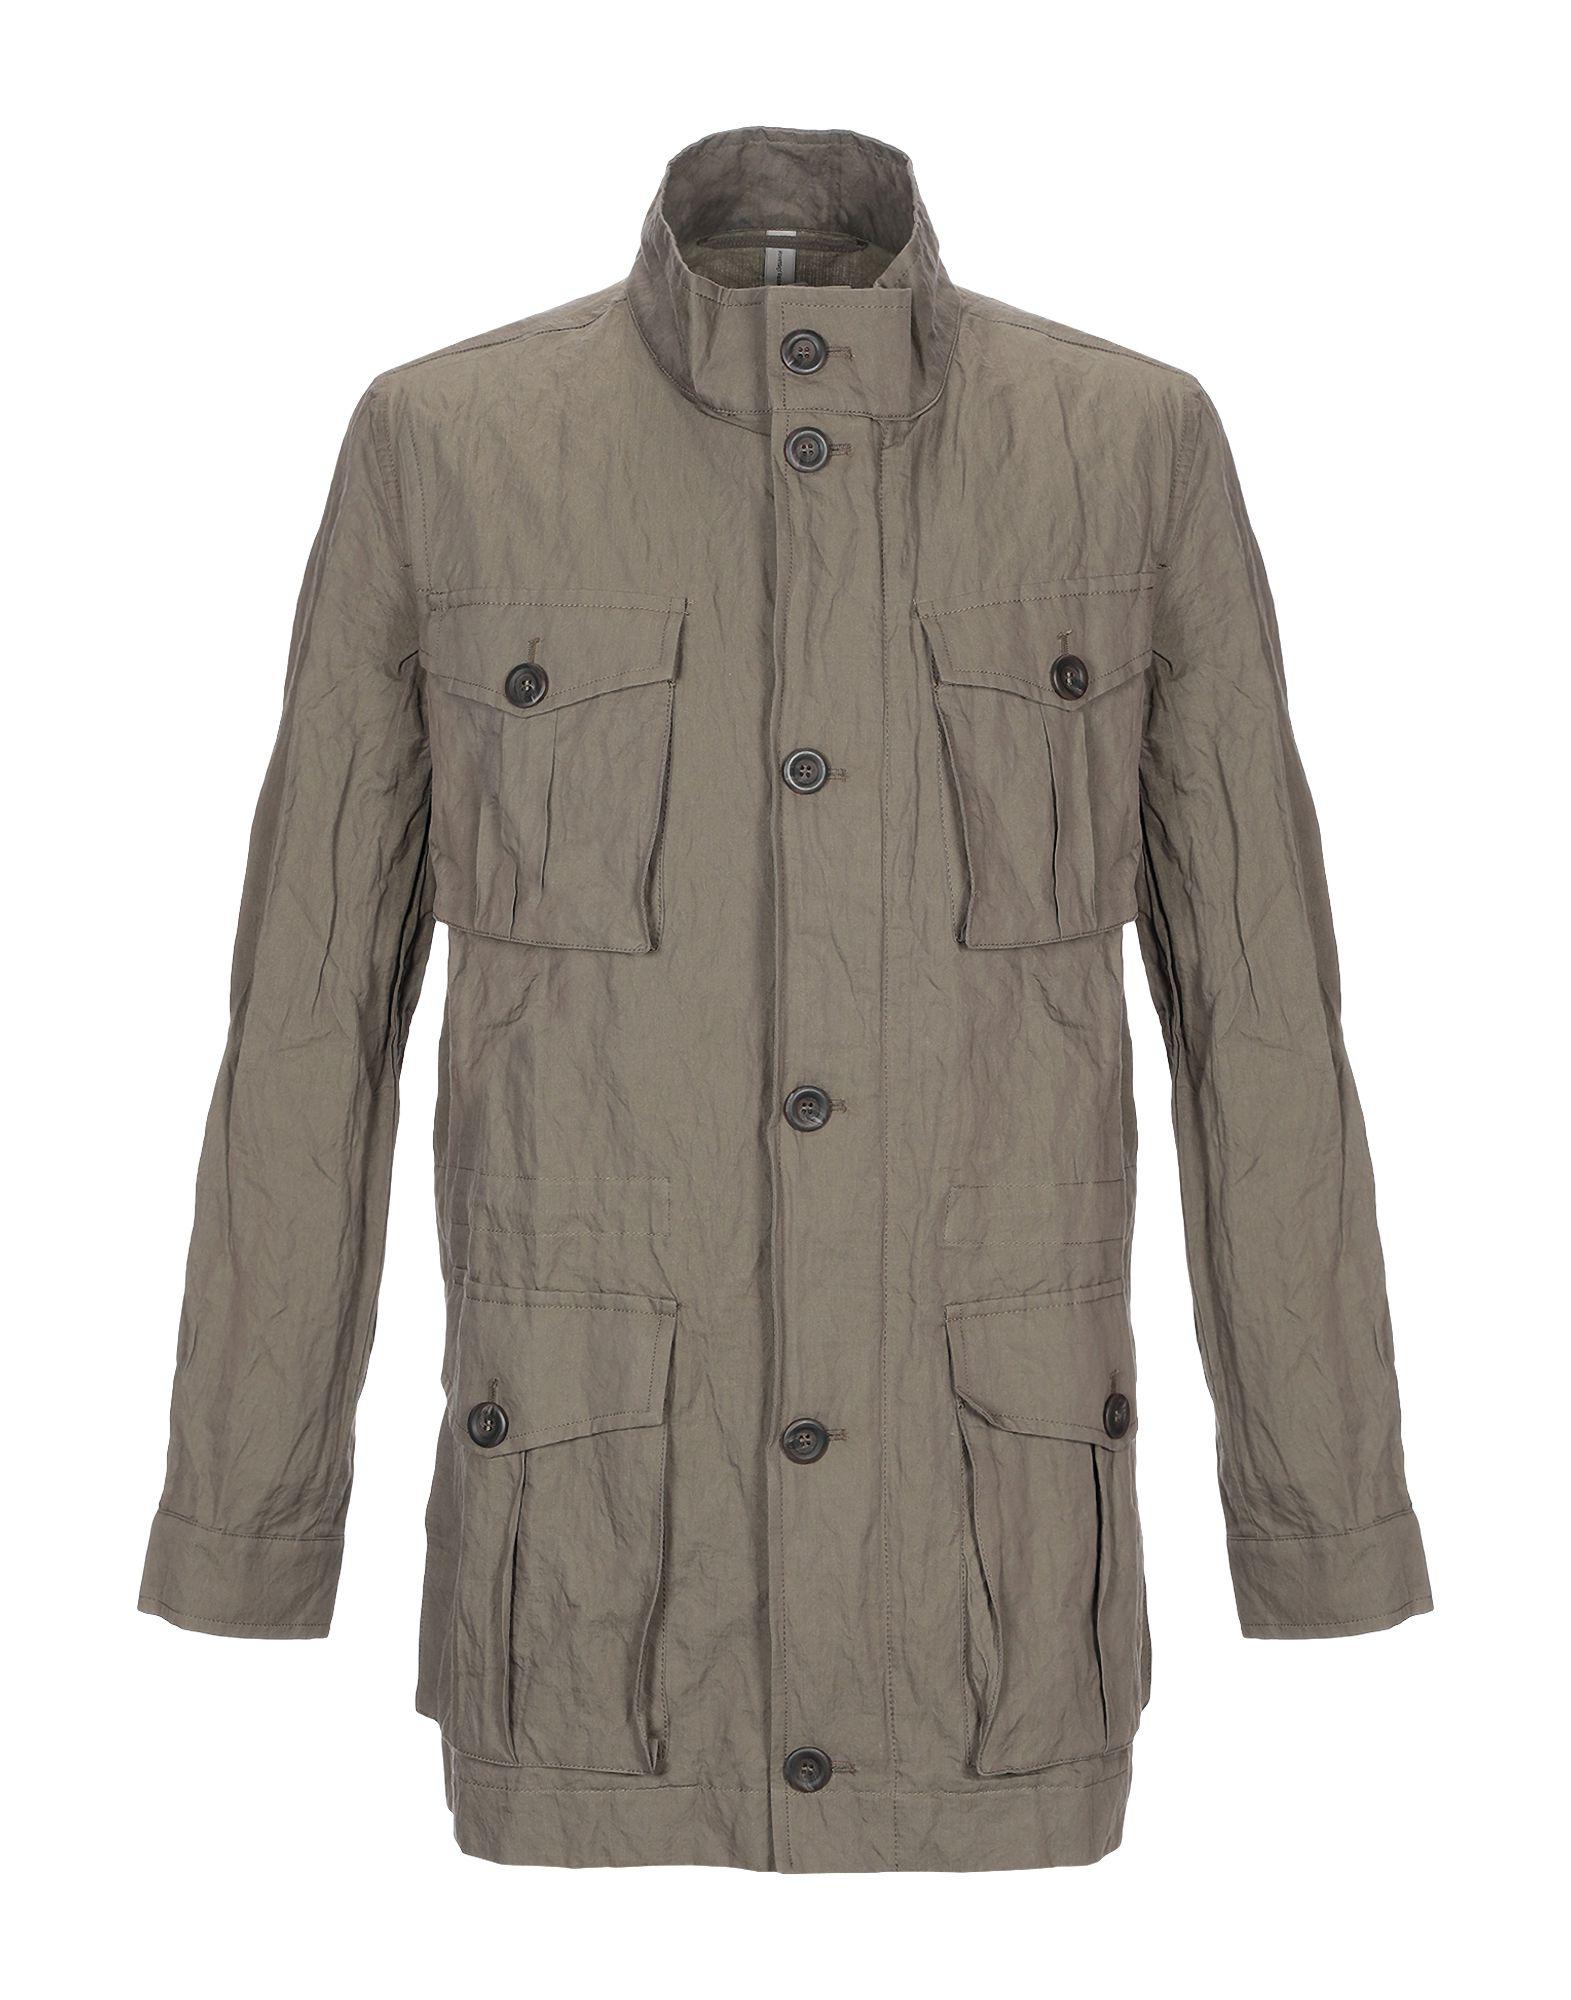 Novemb3r Full-length Jacket In Military Green